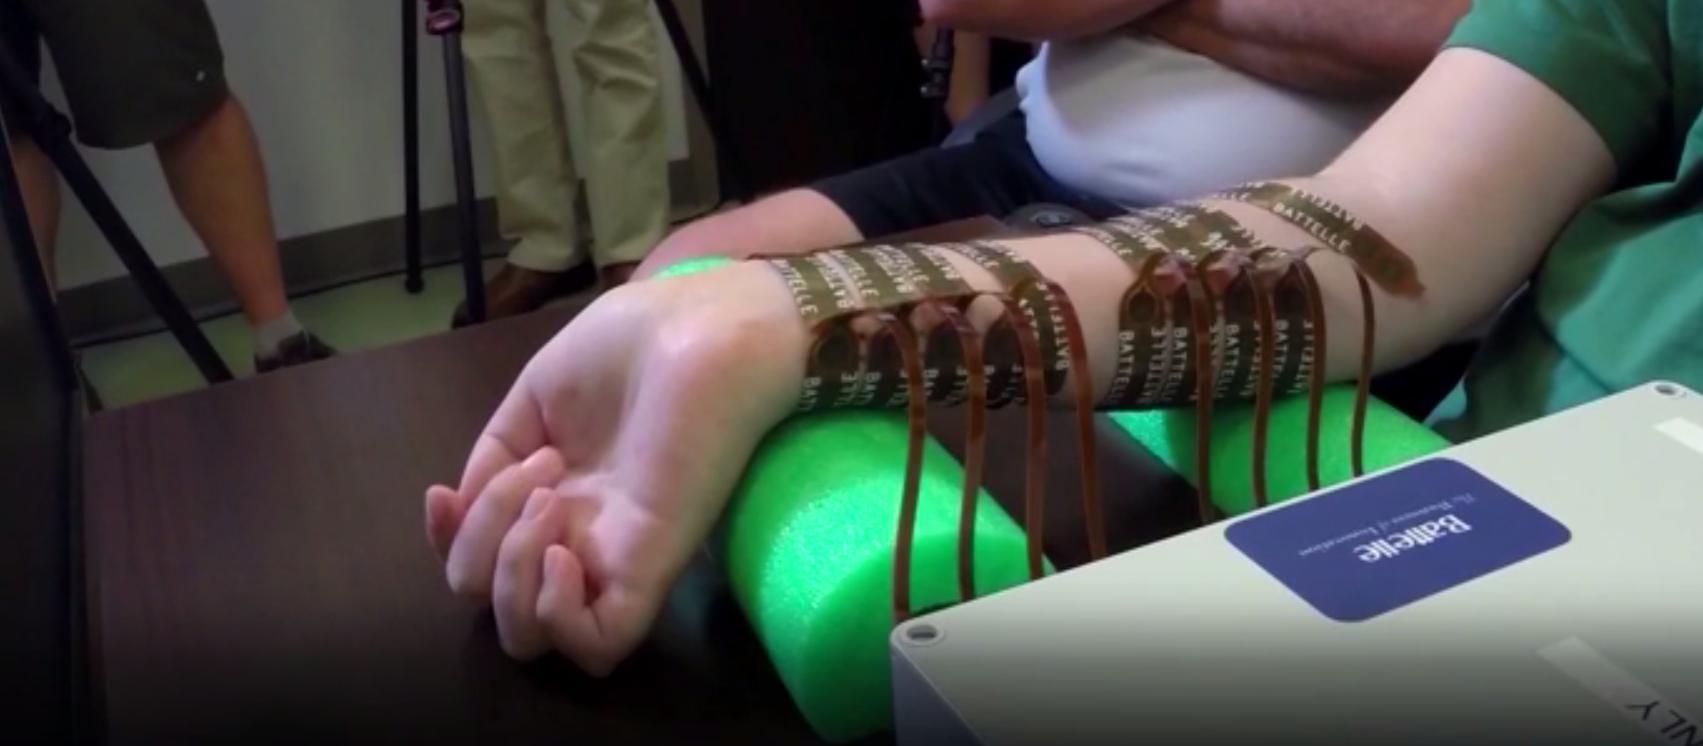 Paralítico logra mover mano con chip